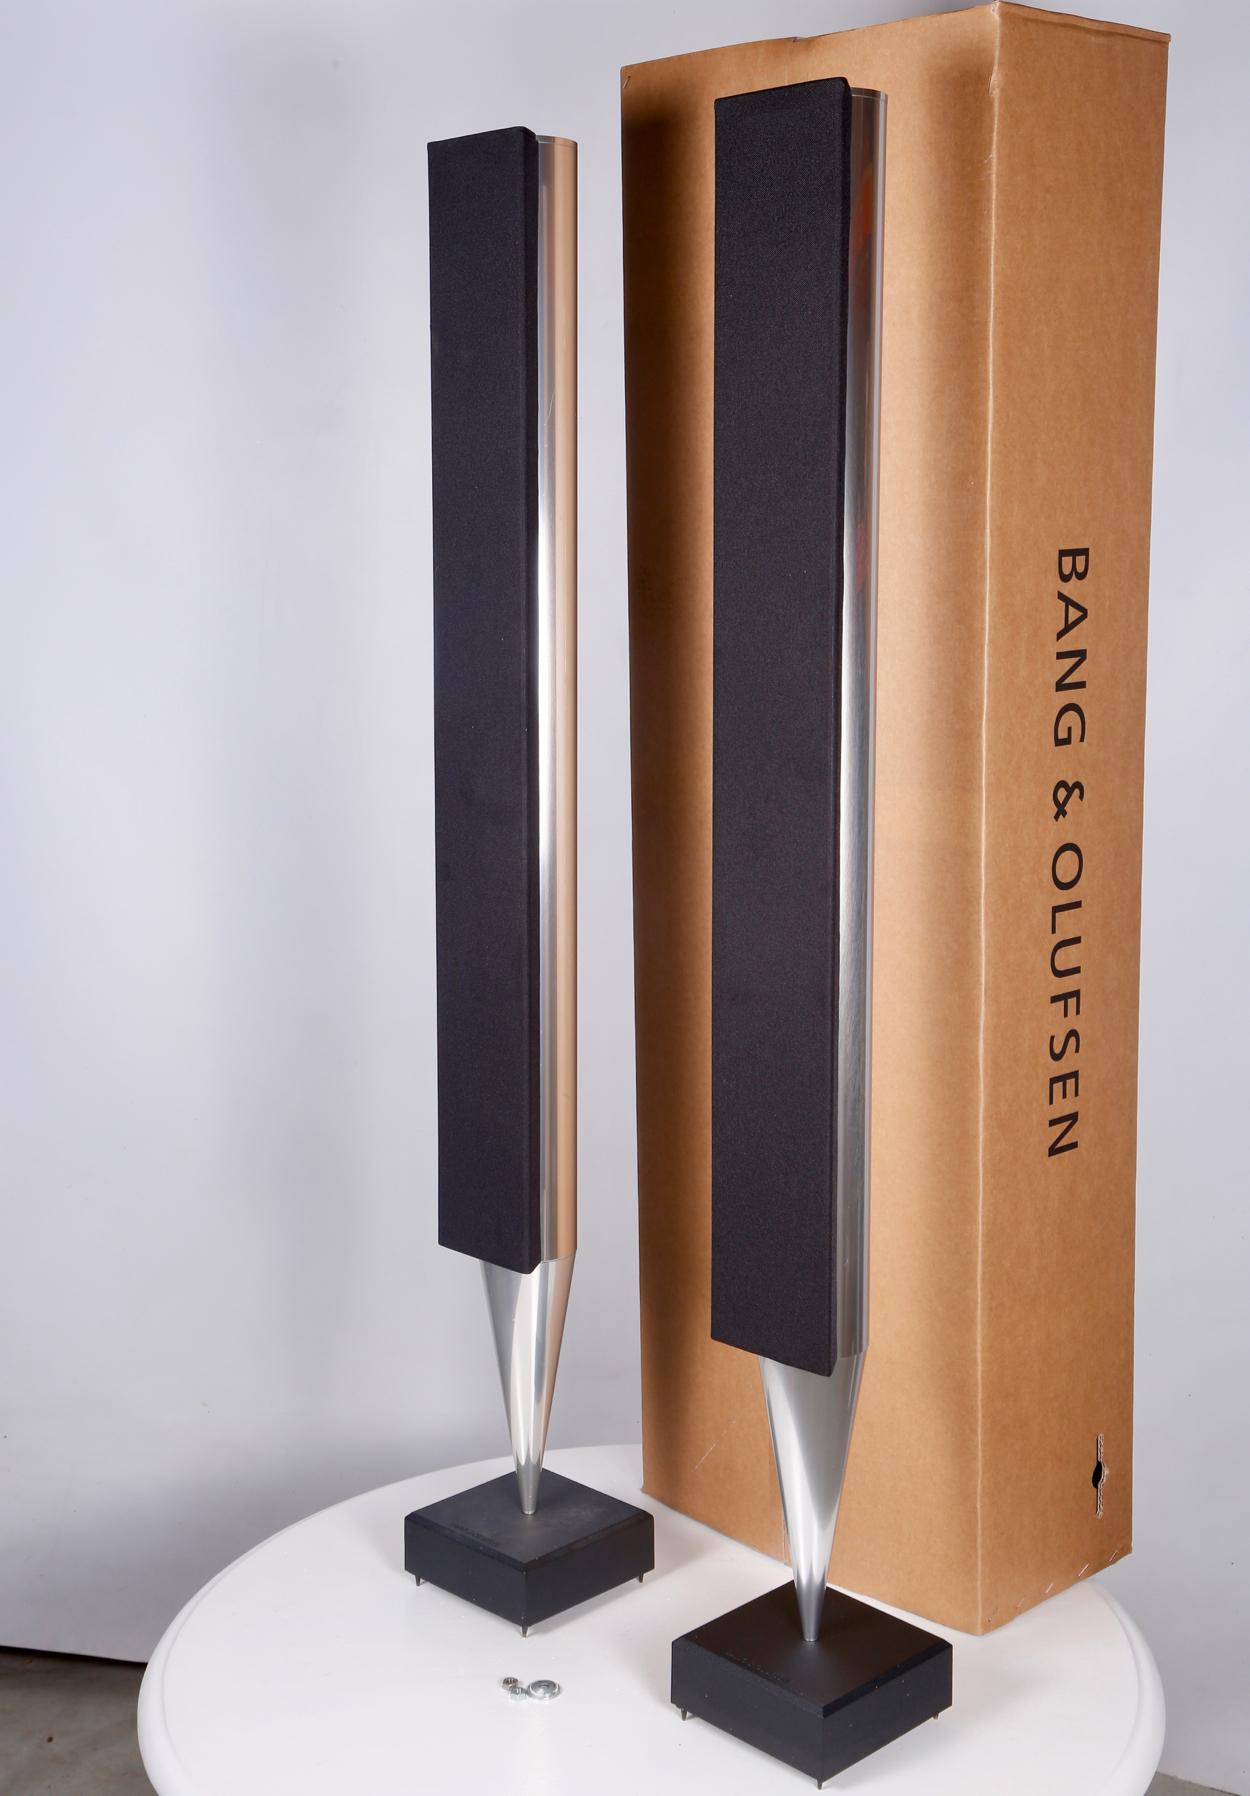 B&O BeoLab 8000 MK2 Speakers